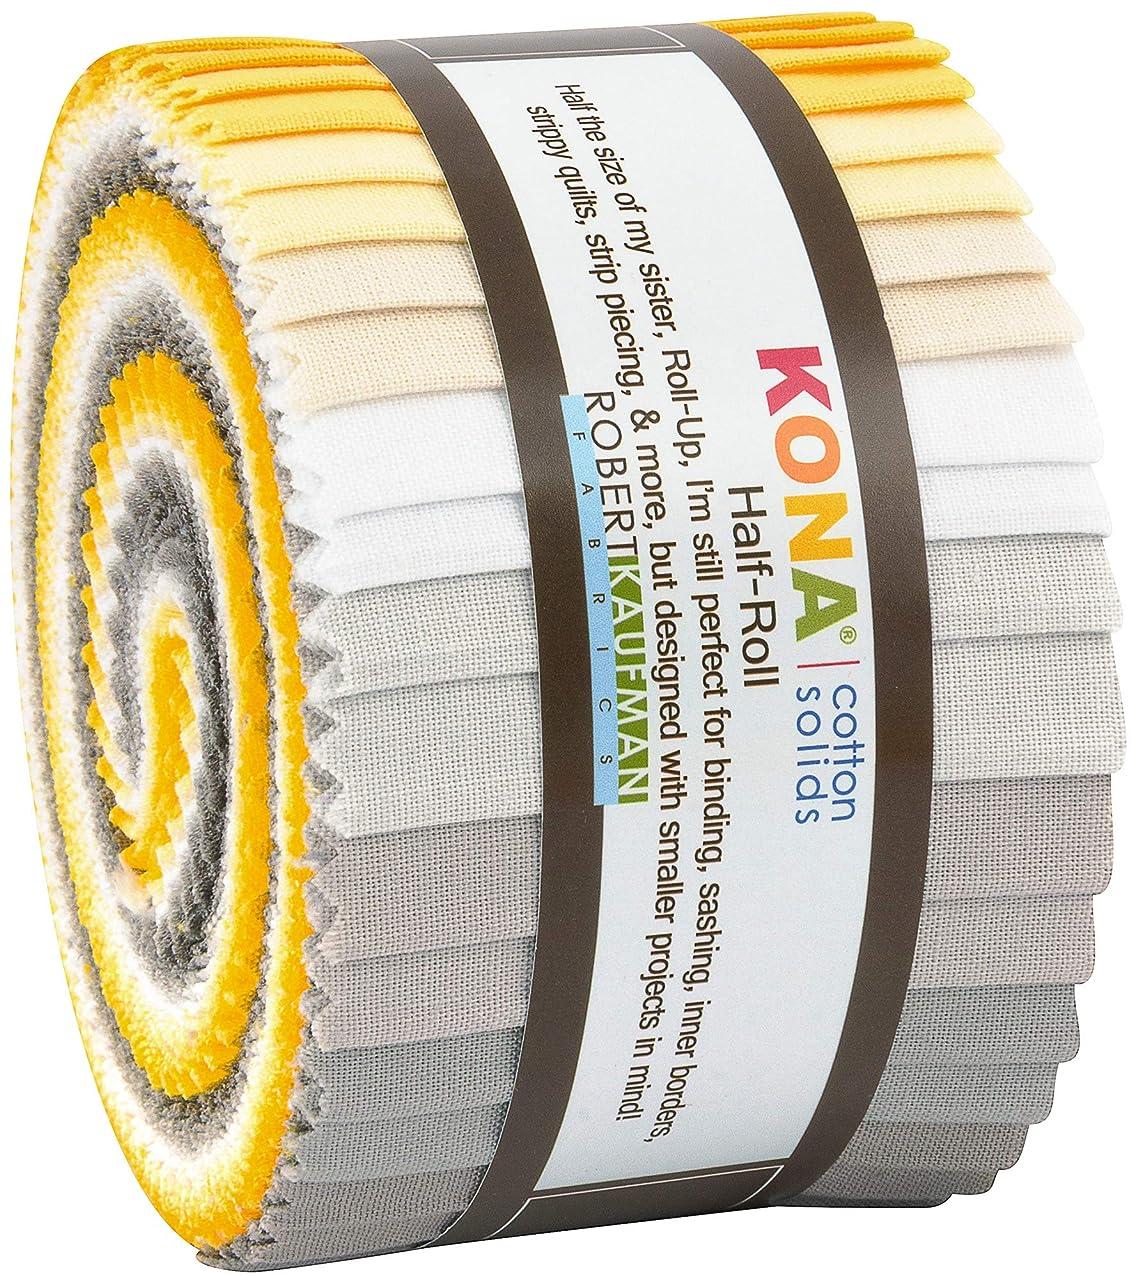 Robert Kaufman Kona Cotton Solids Sunny Side Up Half Roll 2.5